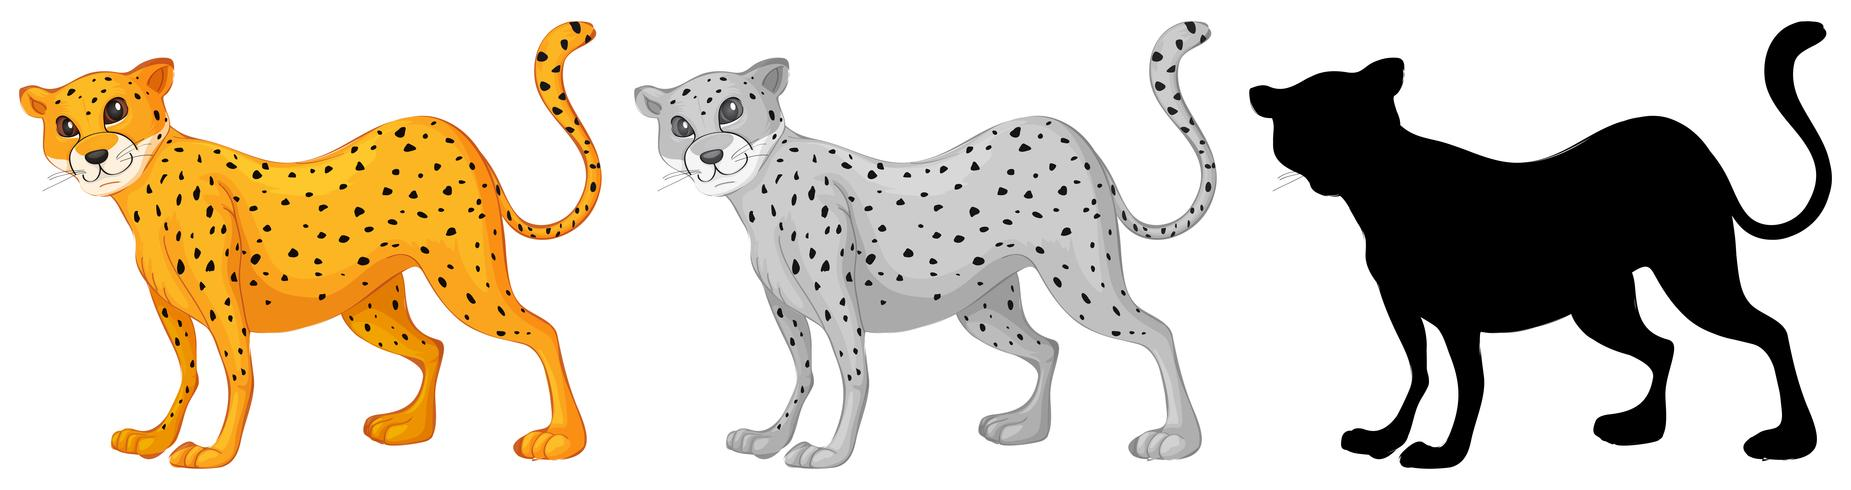 Set of tiger character design